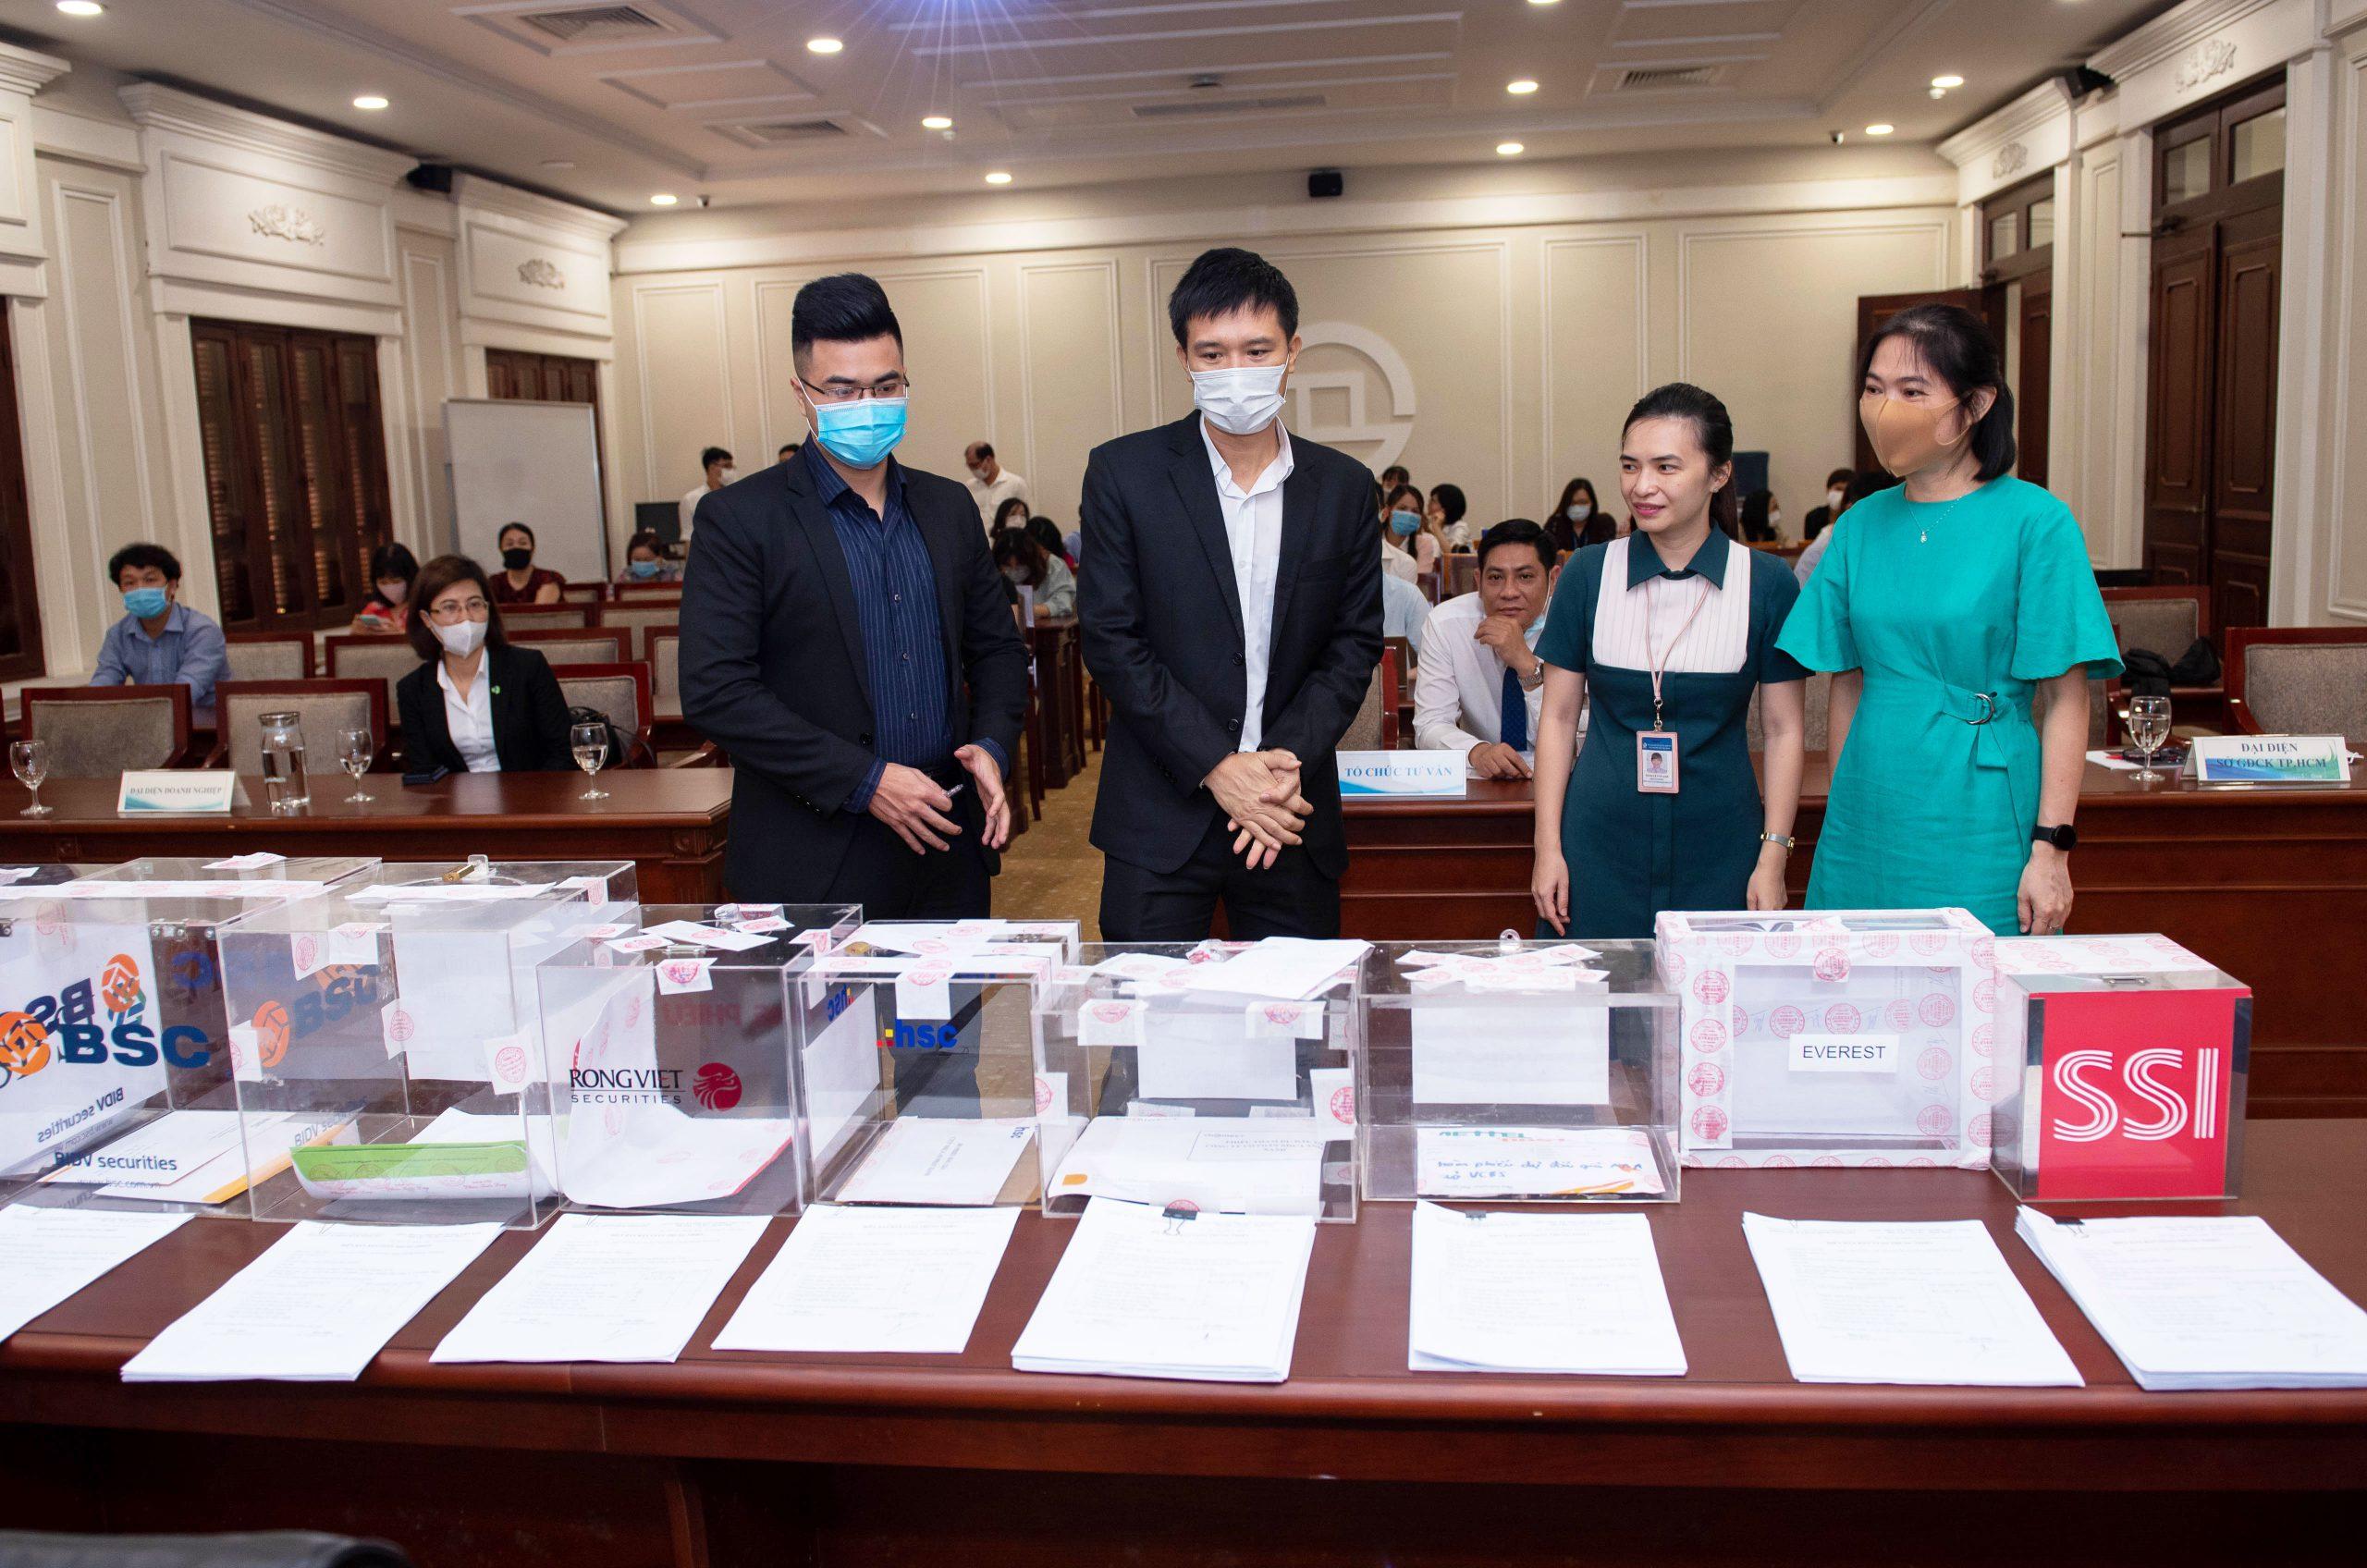 An Phat Bioplastics mobilises VND 1,068 billion from auction of 75 million shares